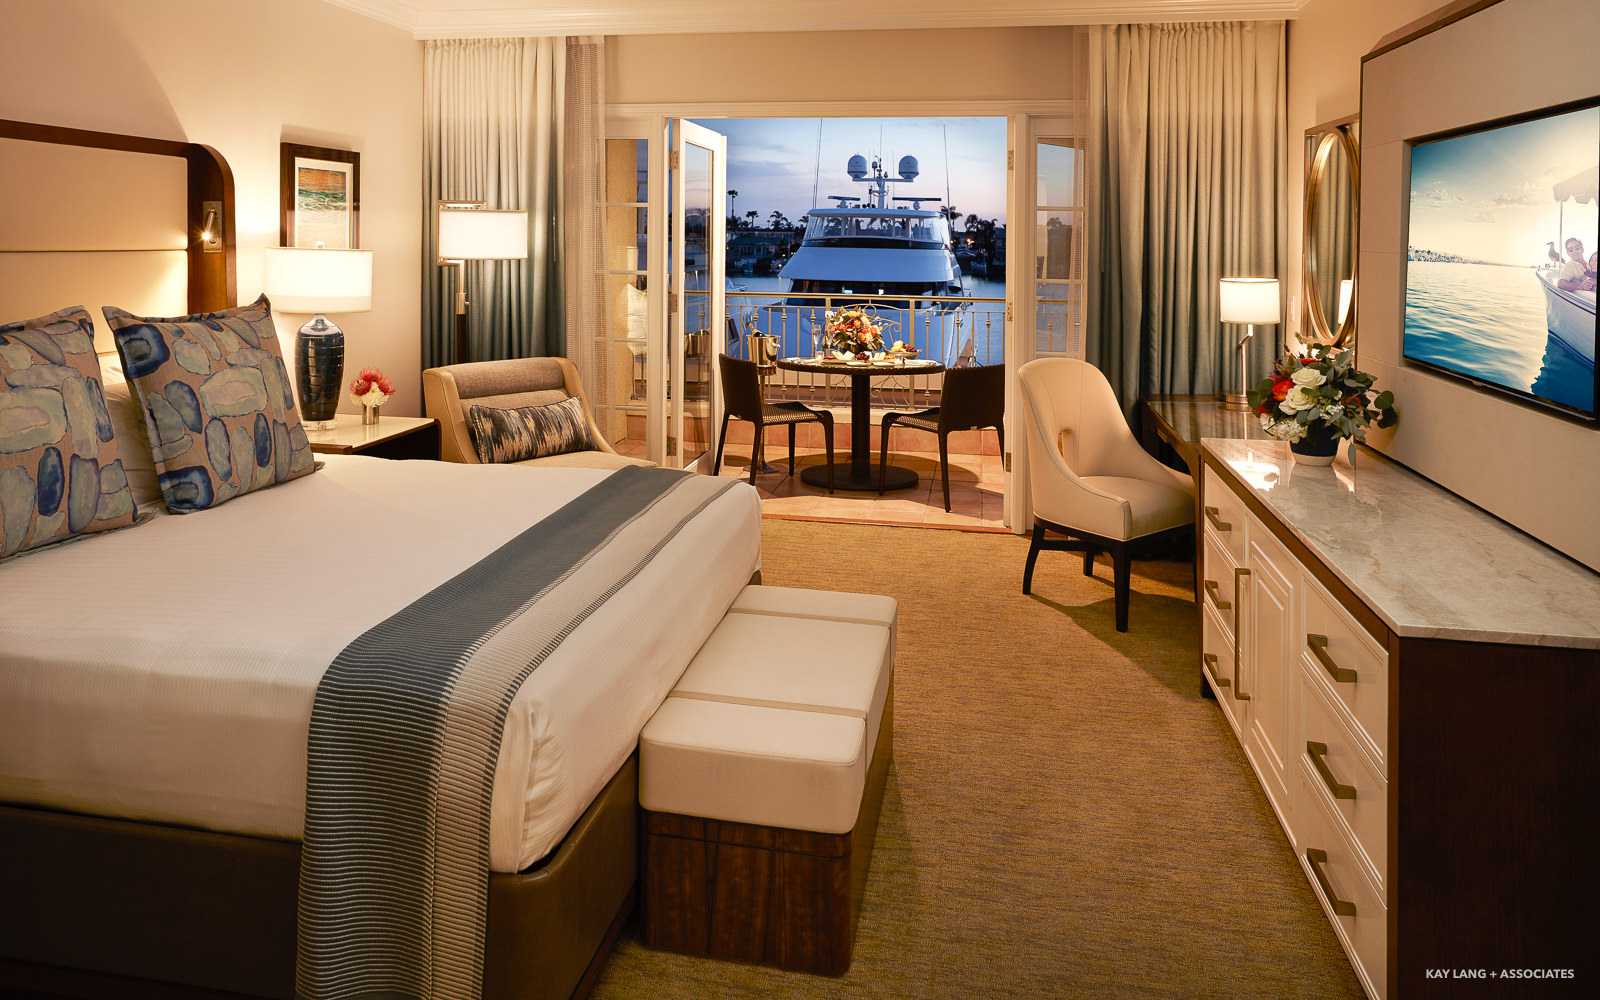 Hotel Interior Design Planning Decorating Furnishing Los Angeles Kay ...